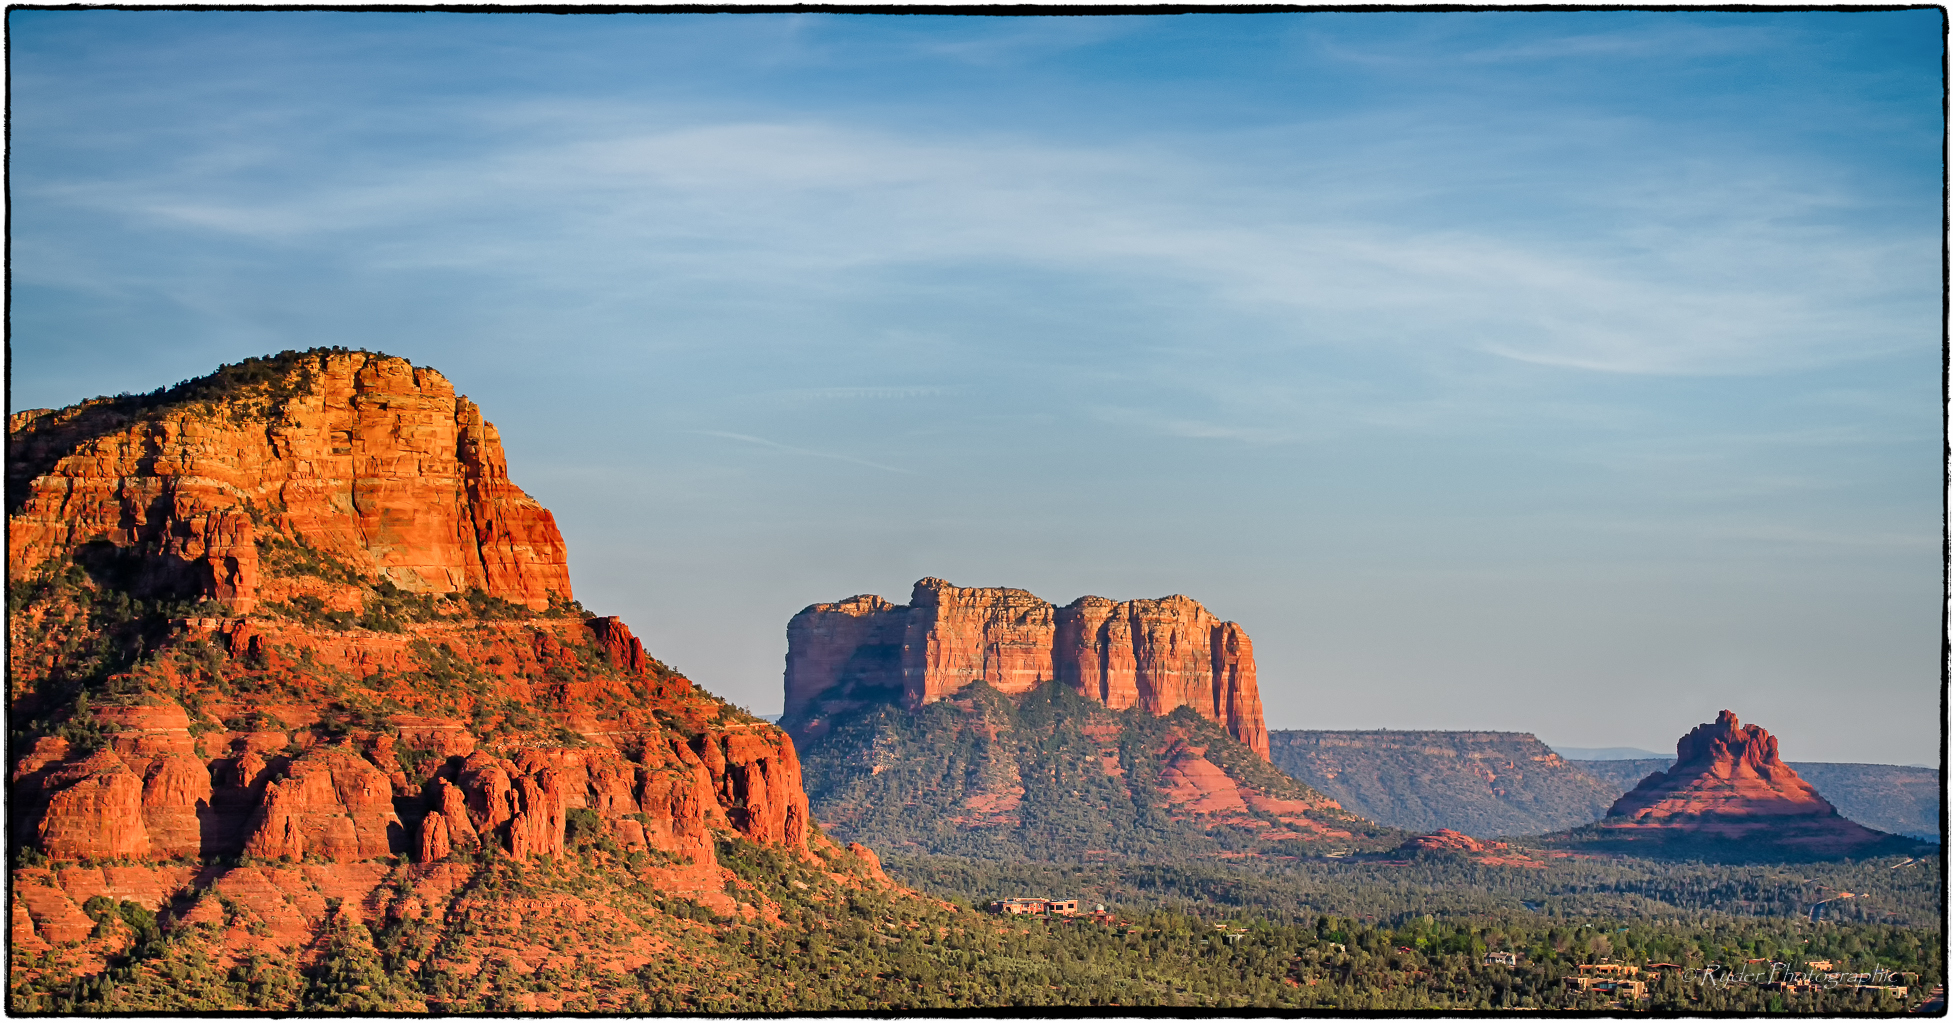 Fairway Oaks Dr, Sedona, AZ, USA Sunrise Sunset Times